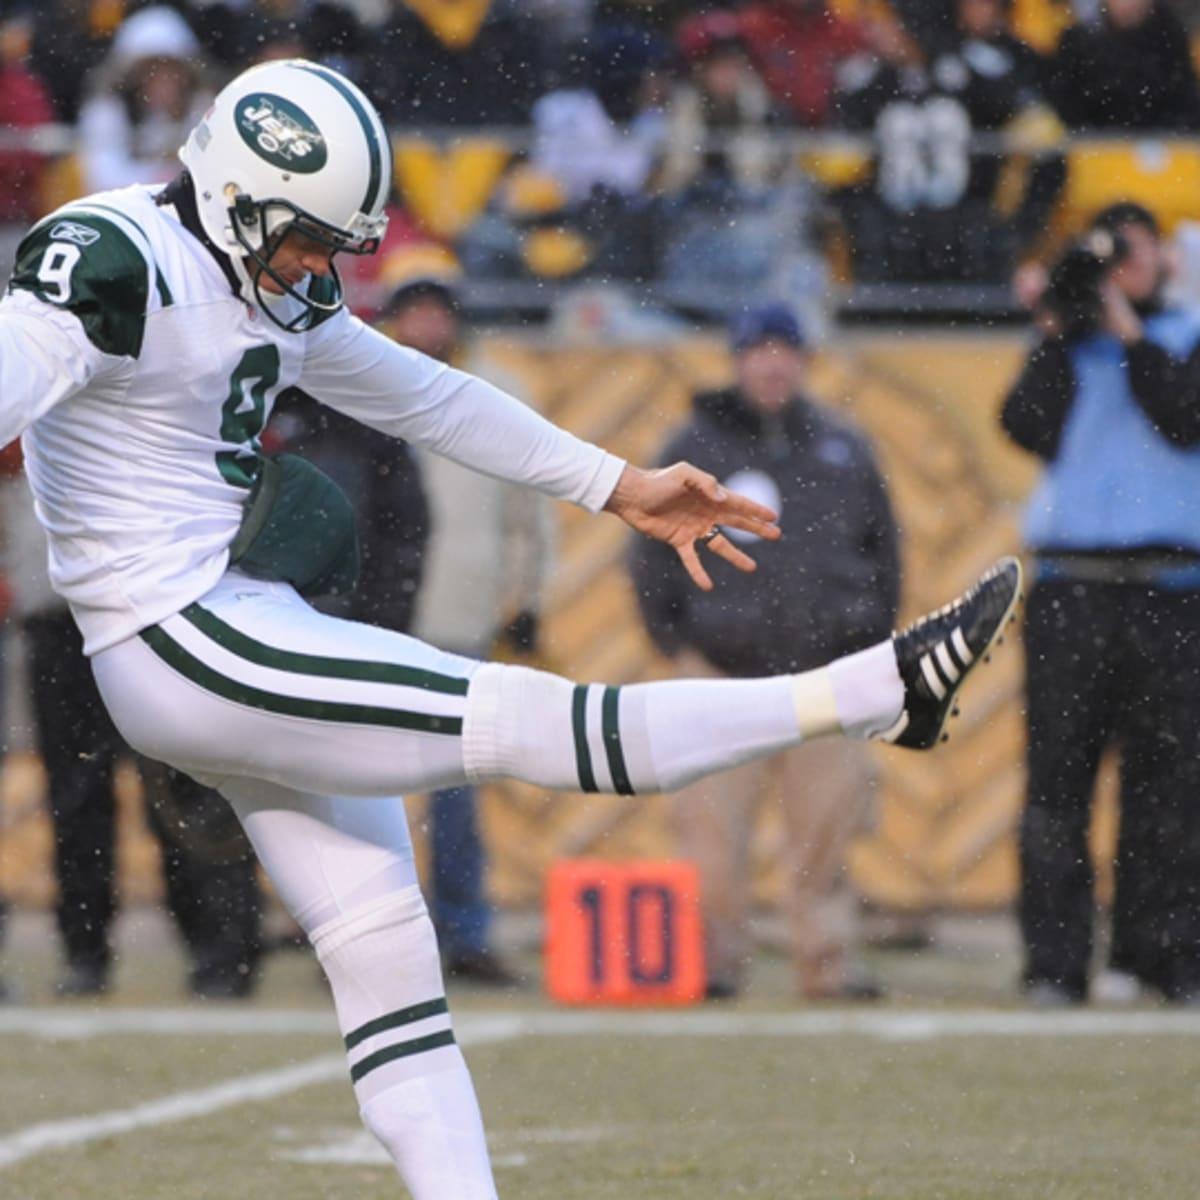 New York Jets sign punter Steve Weatherford, former Giant - Sports ...